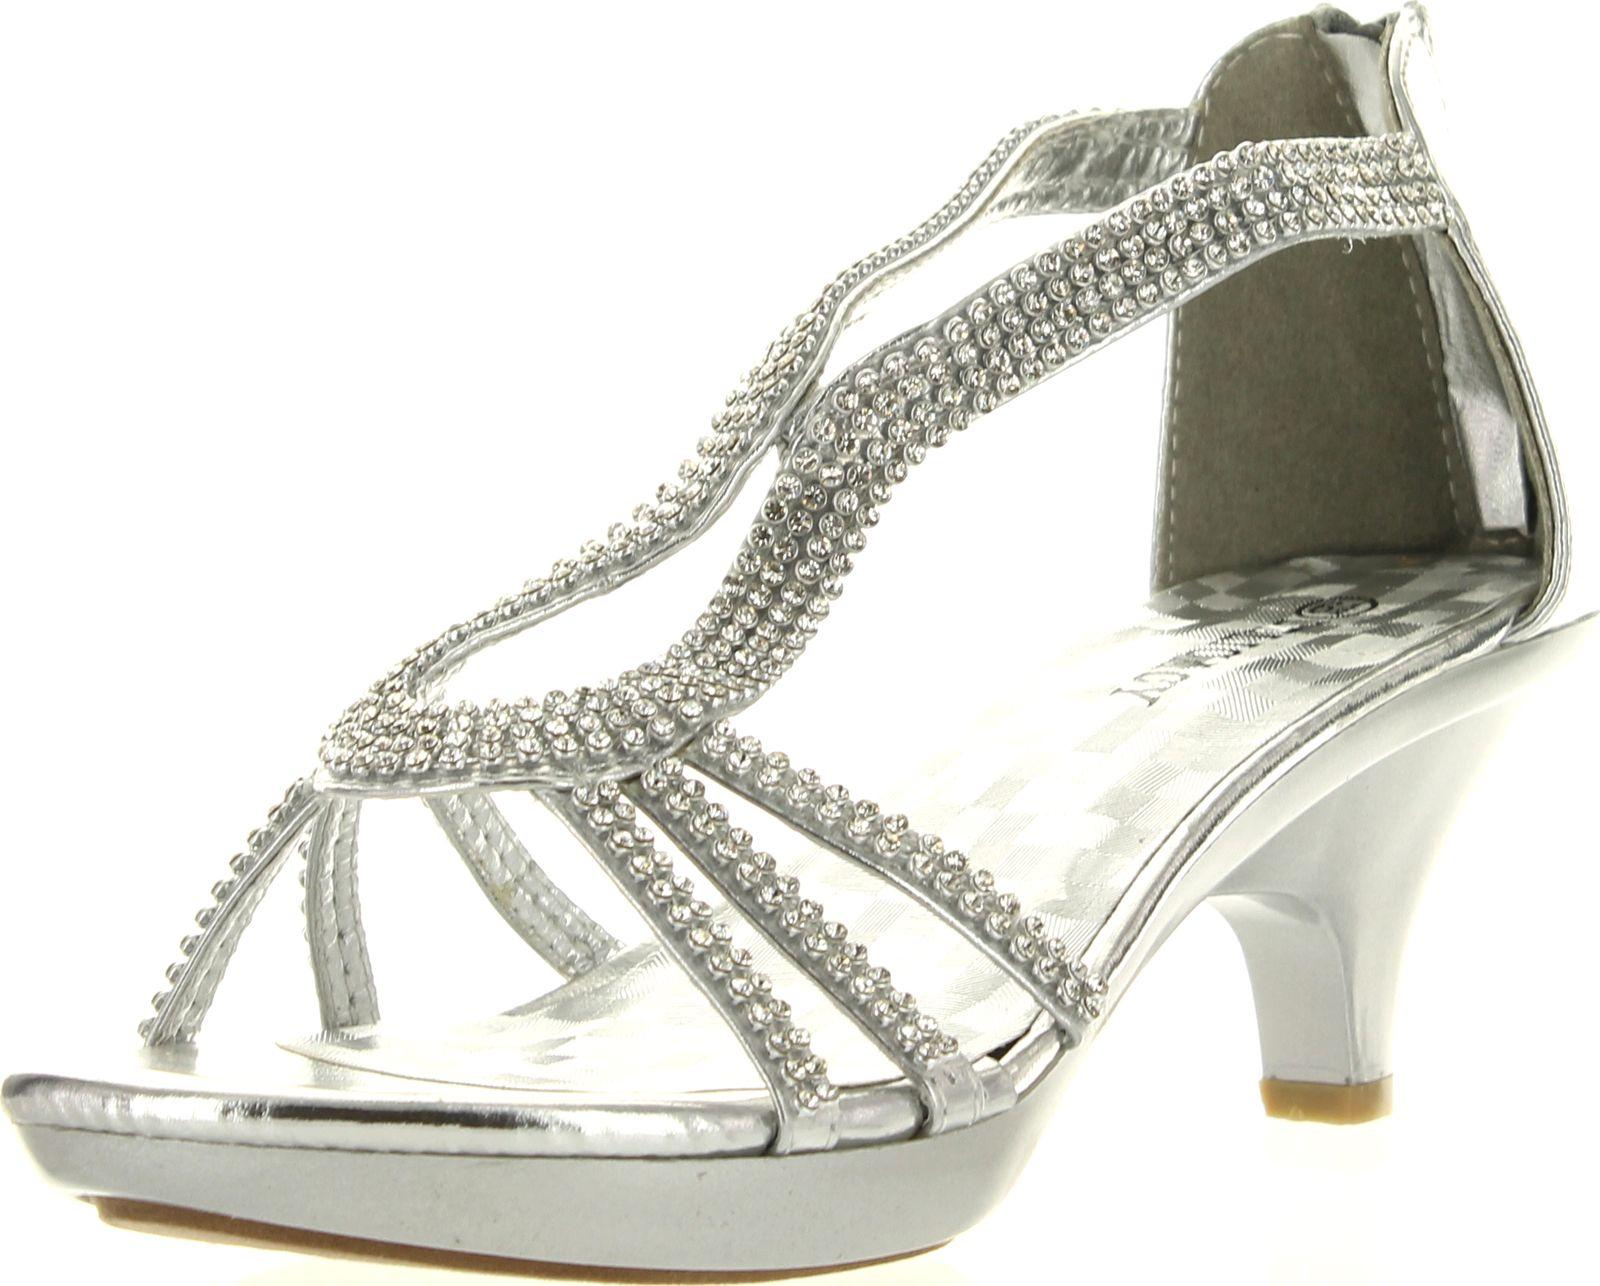 Delicacy Angel 36 Women Dress Sandals Rhinestone Platform Pumps Wedding Bridal Low Heel Shoes